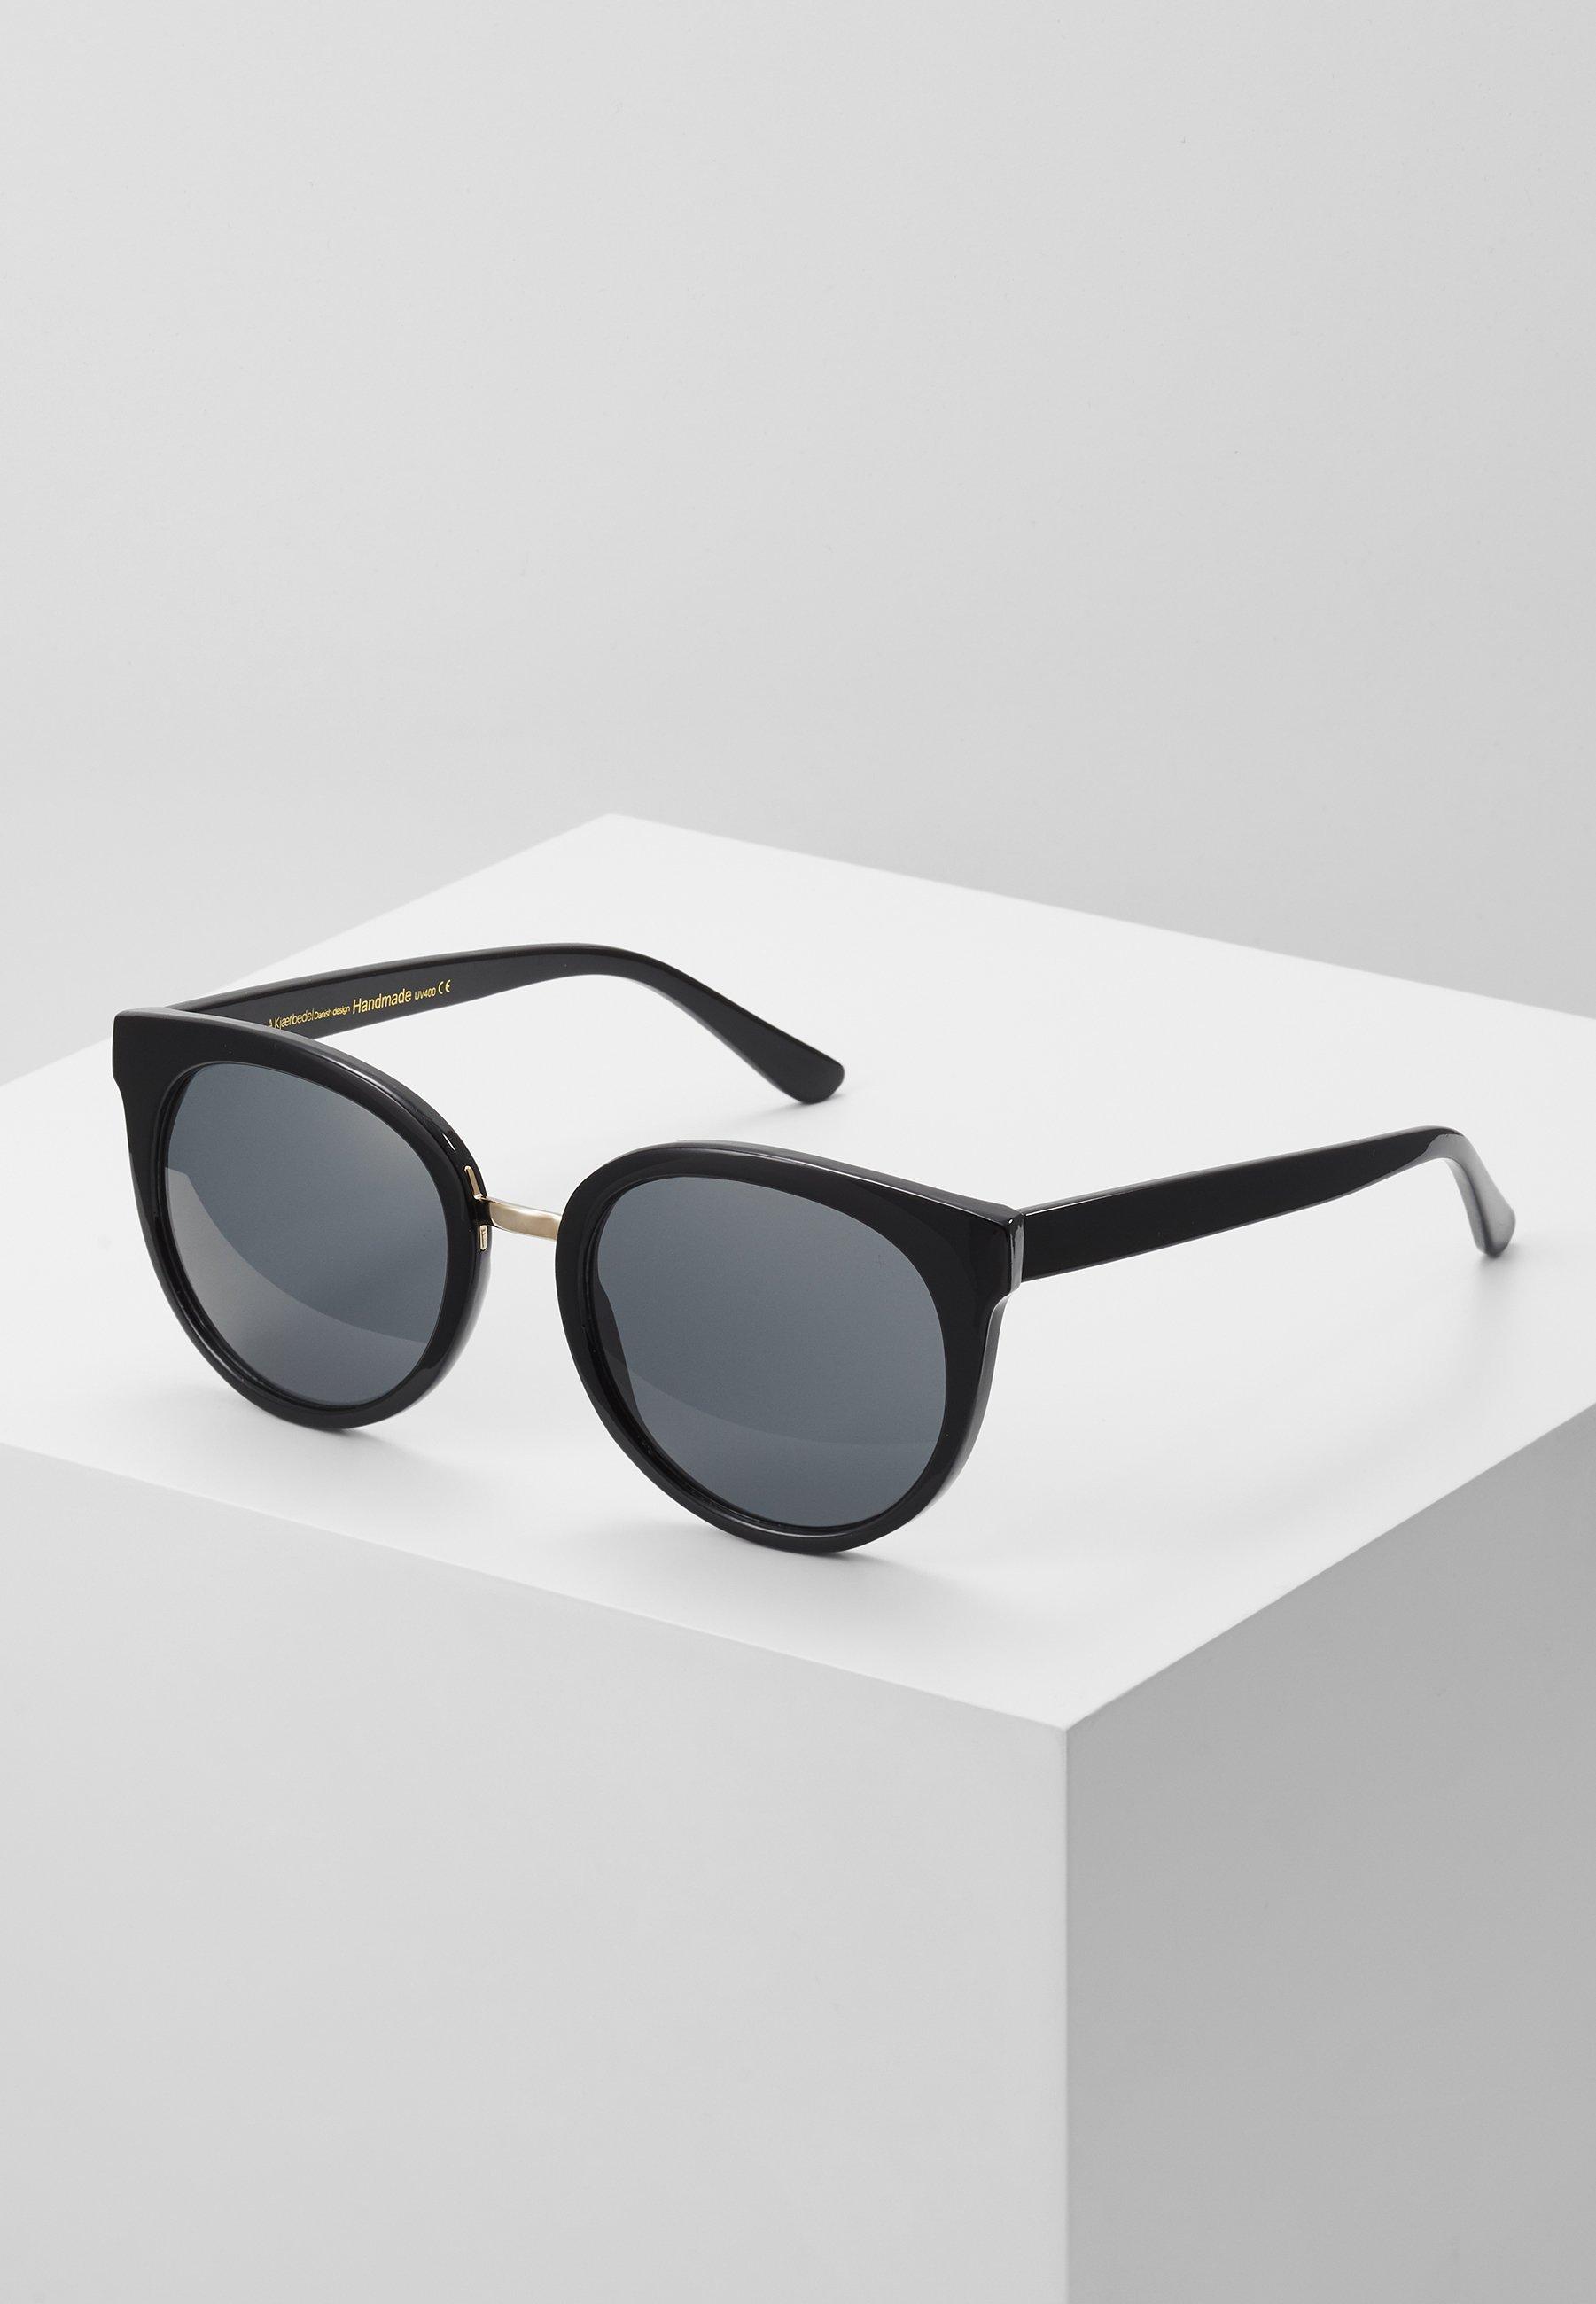 A.Kjærbede Sunglasses - black